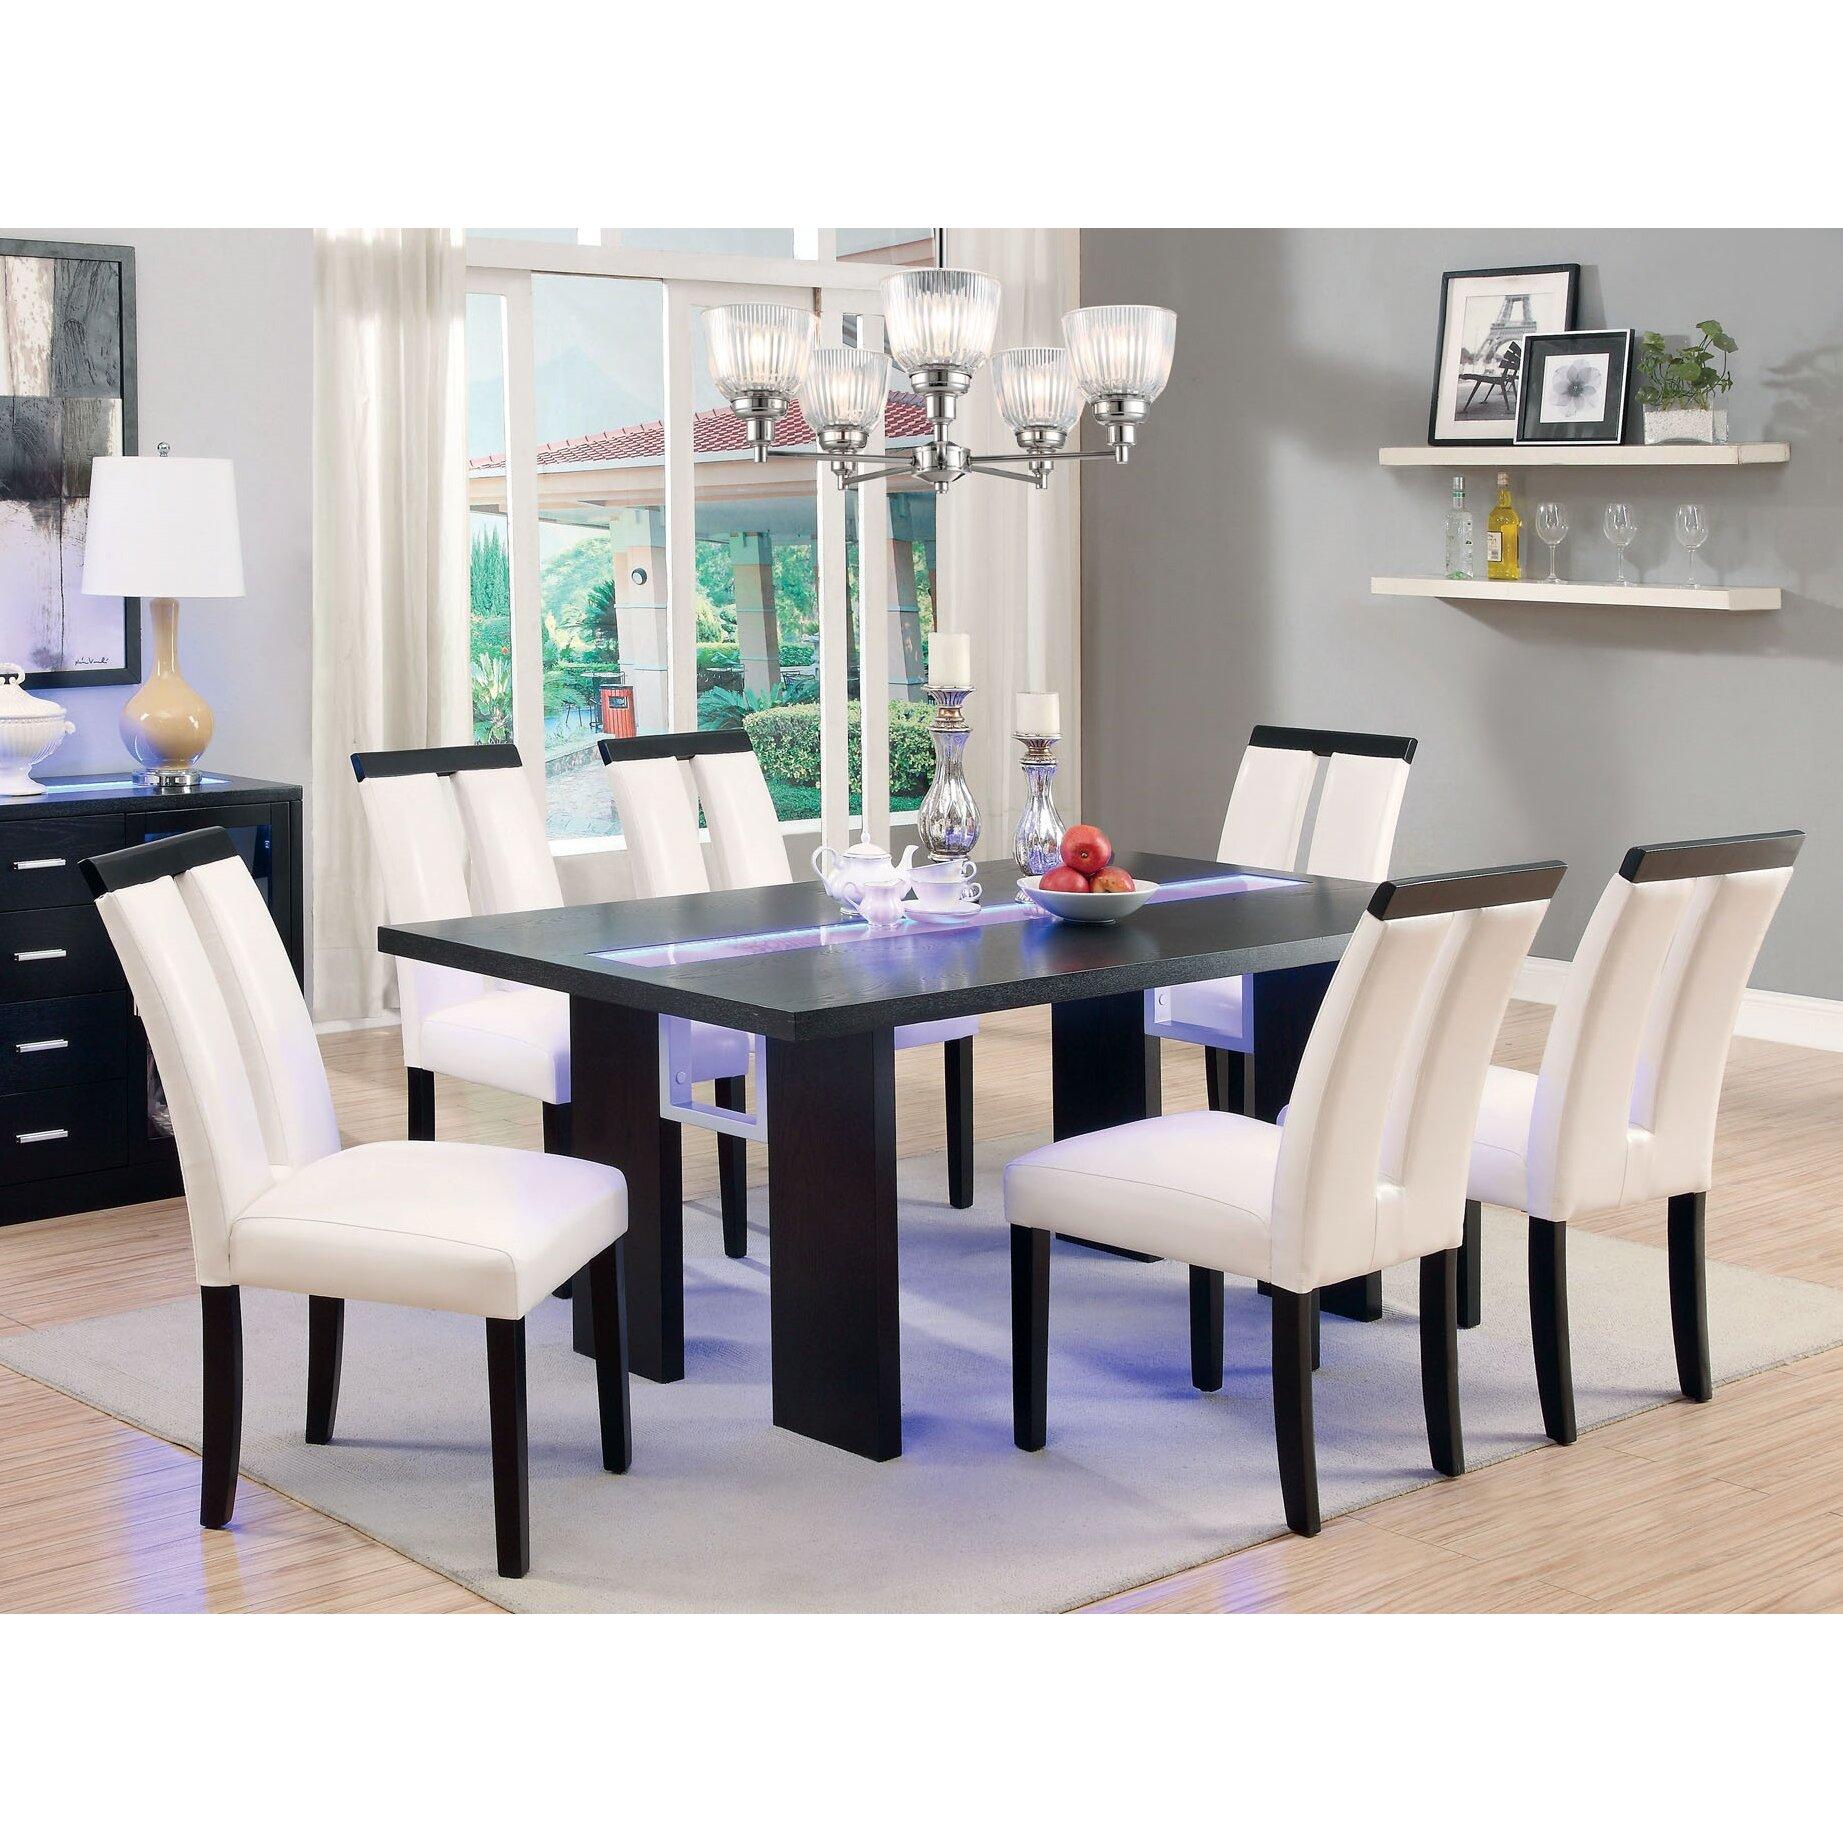 Coaster Carone Contemporary Glam Dining Room Set With: Hokku Designs Luminate 7 Piece LED Dining Set & Reviews